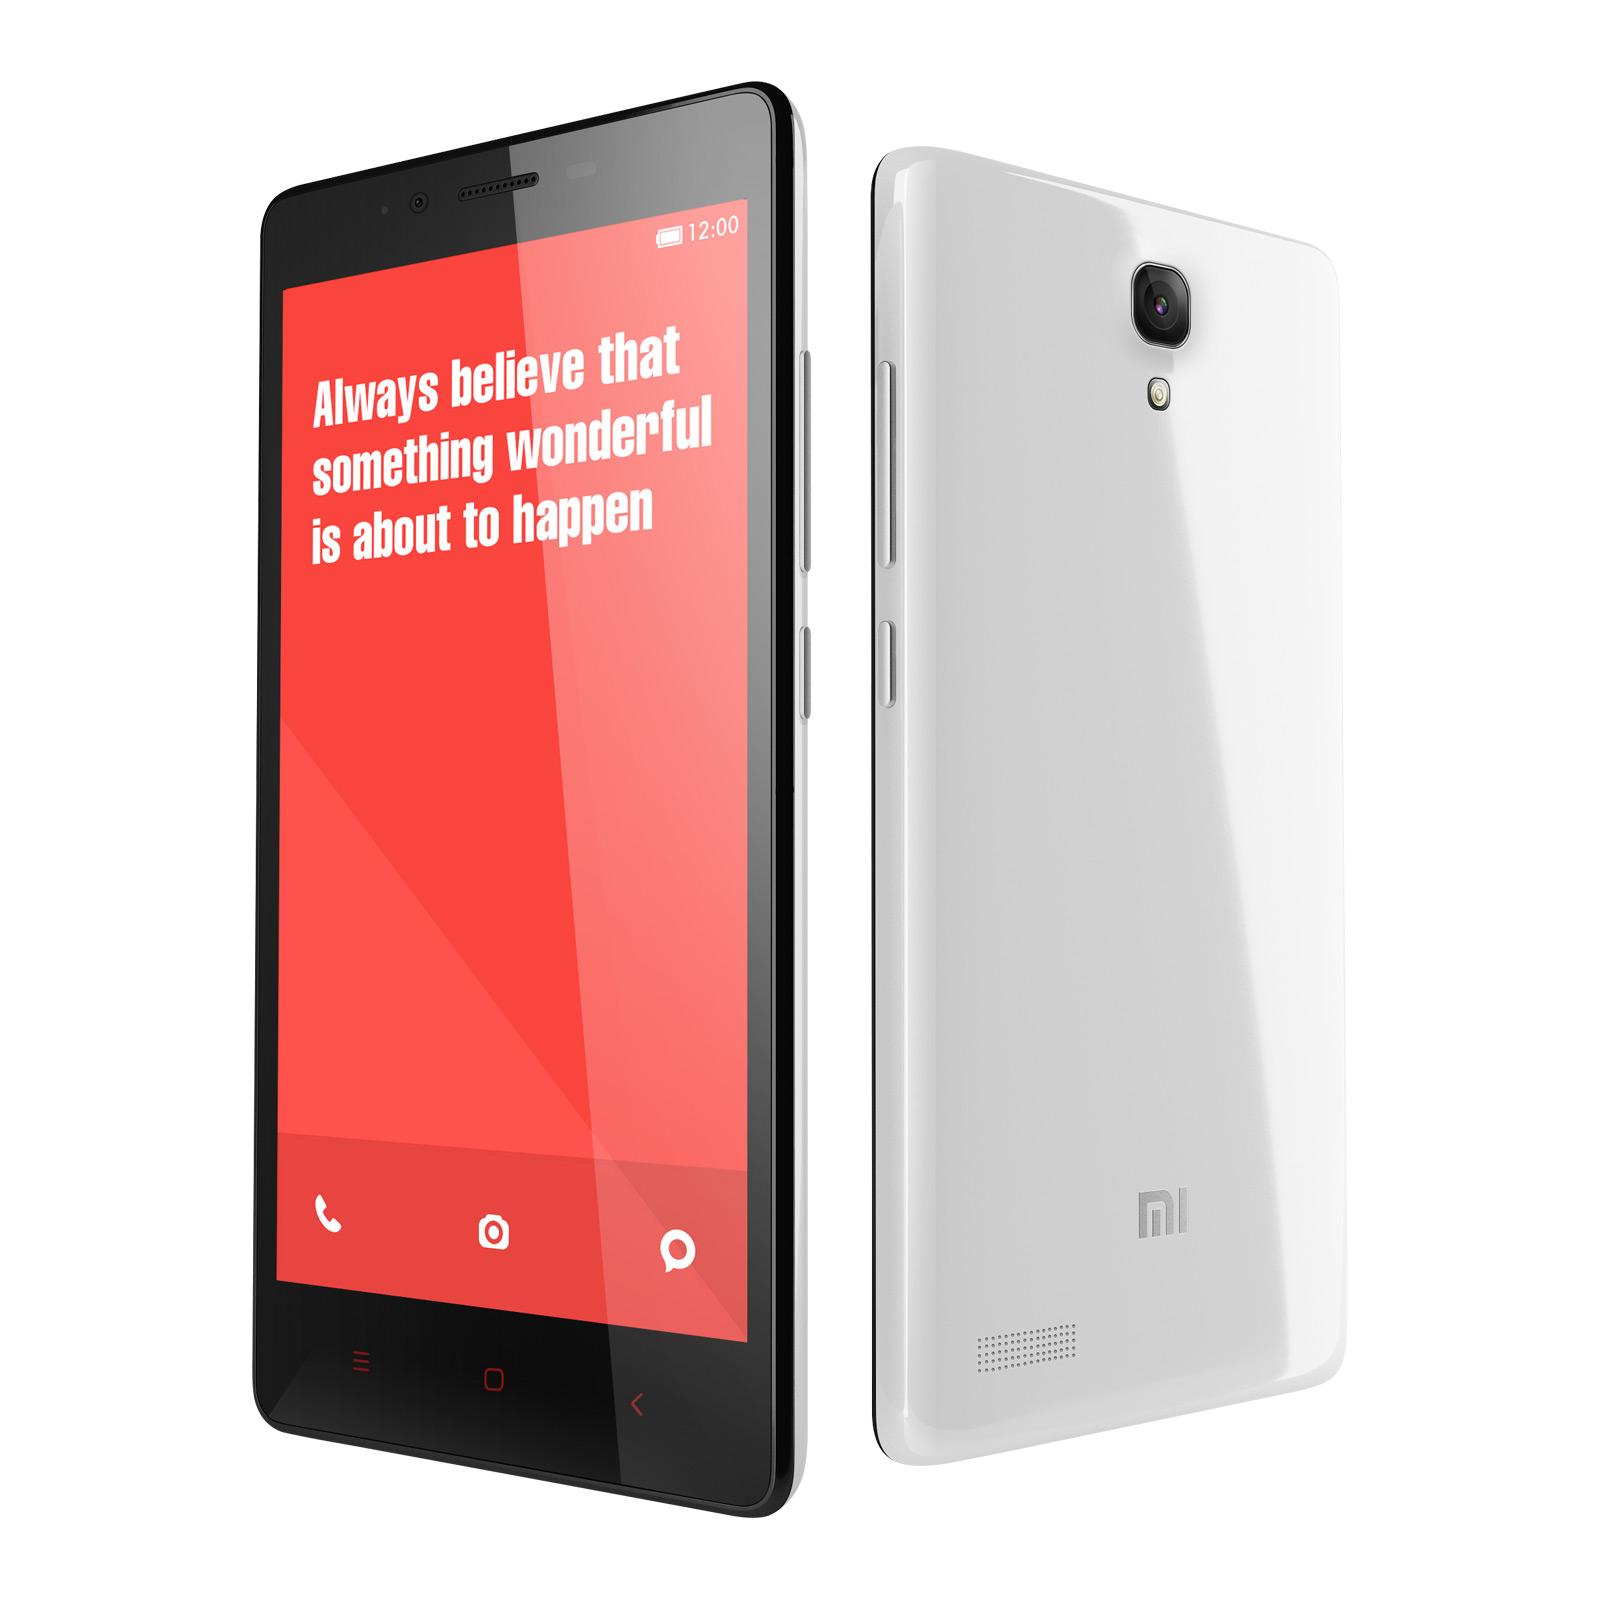 Harga HP Xiaomi Redmi Note 4G